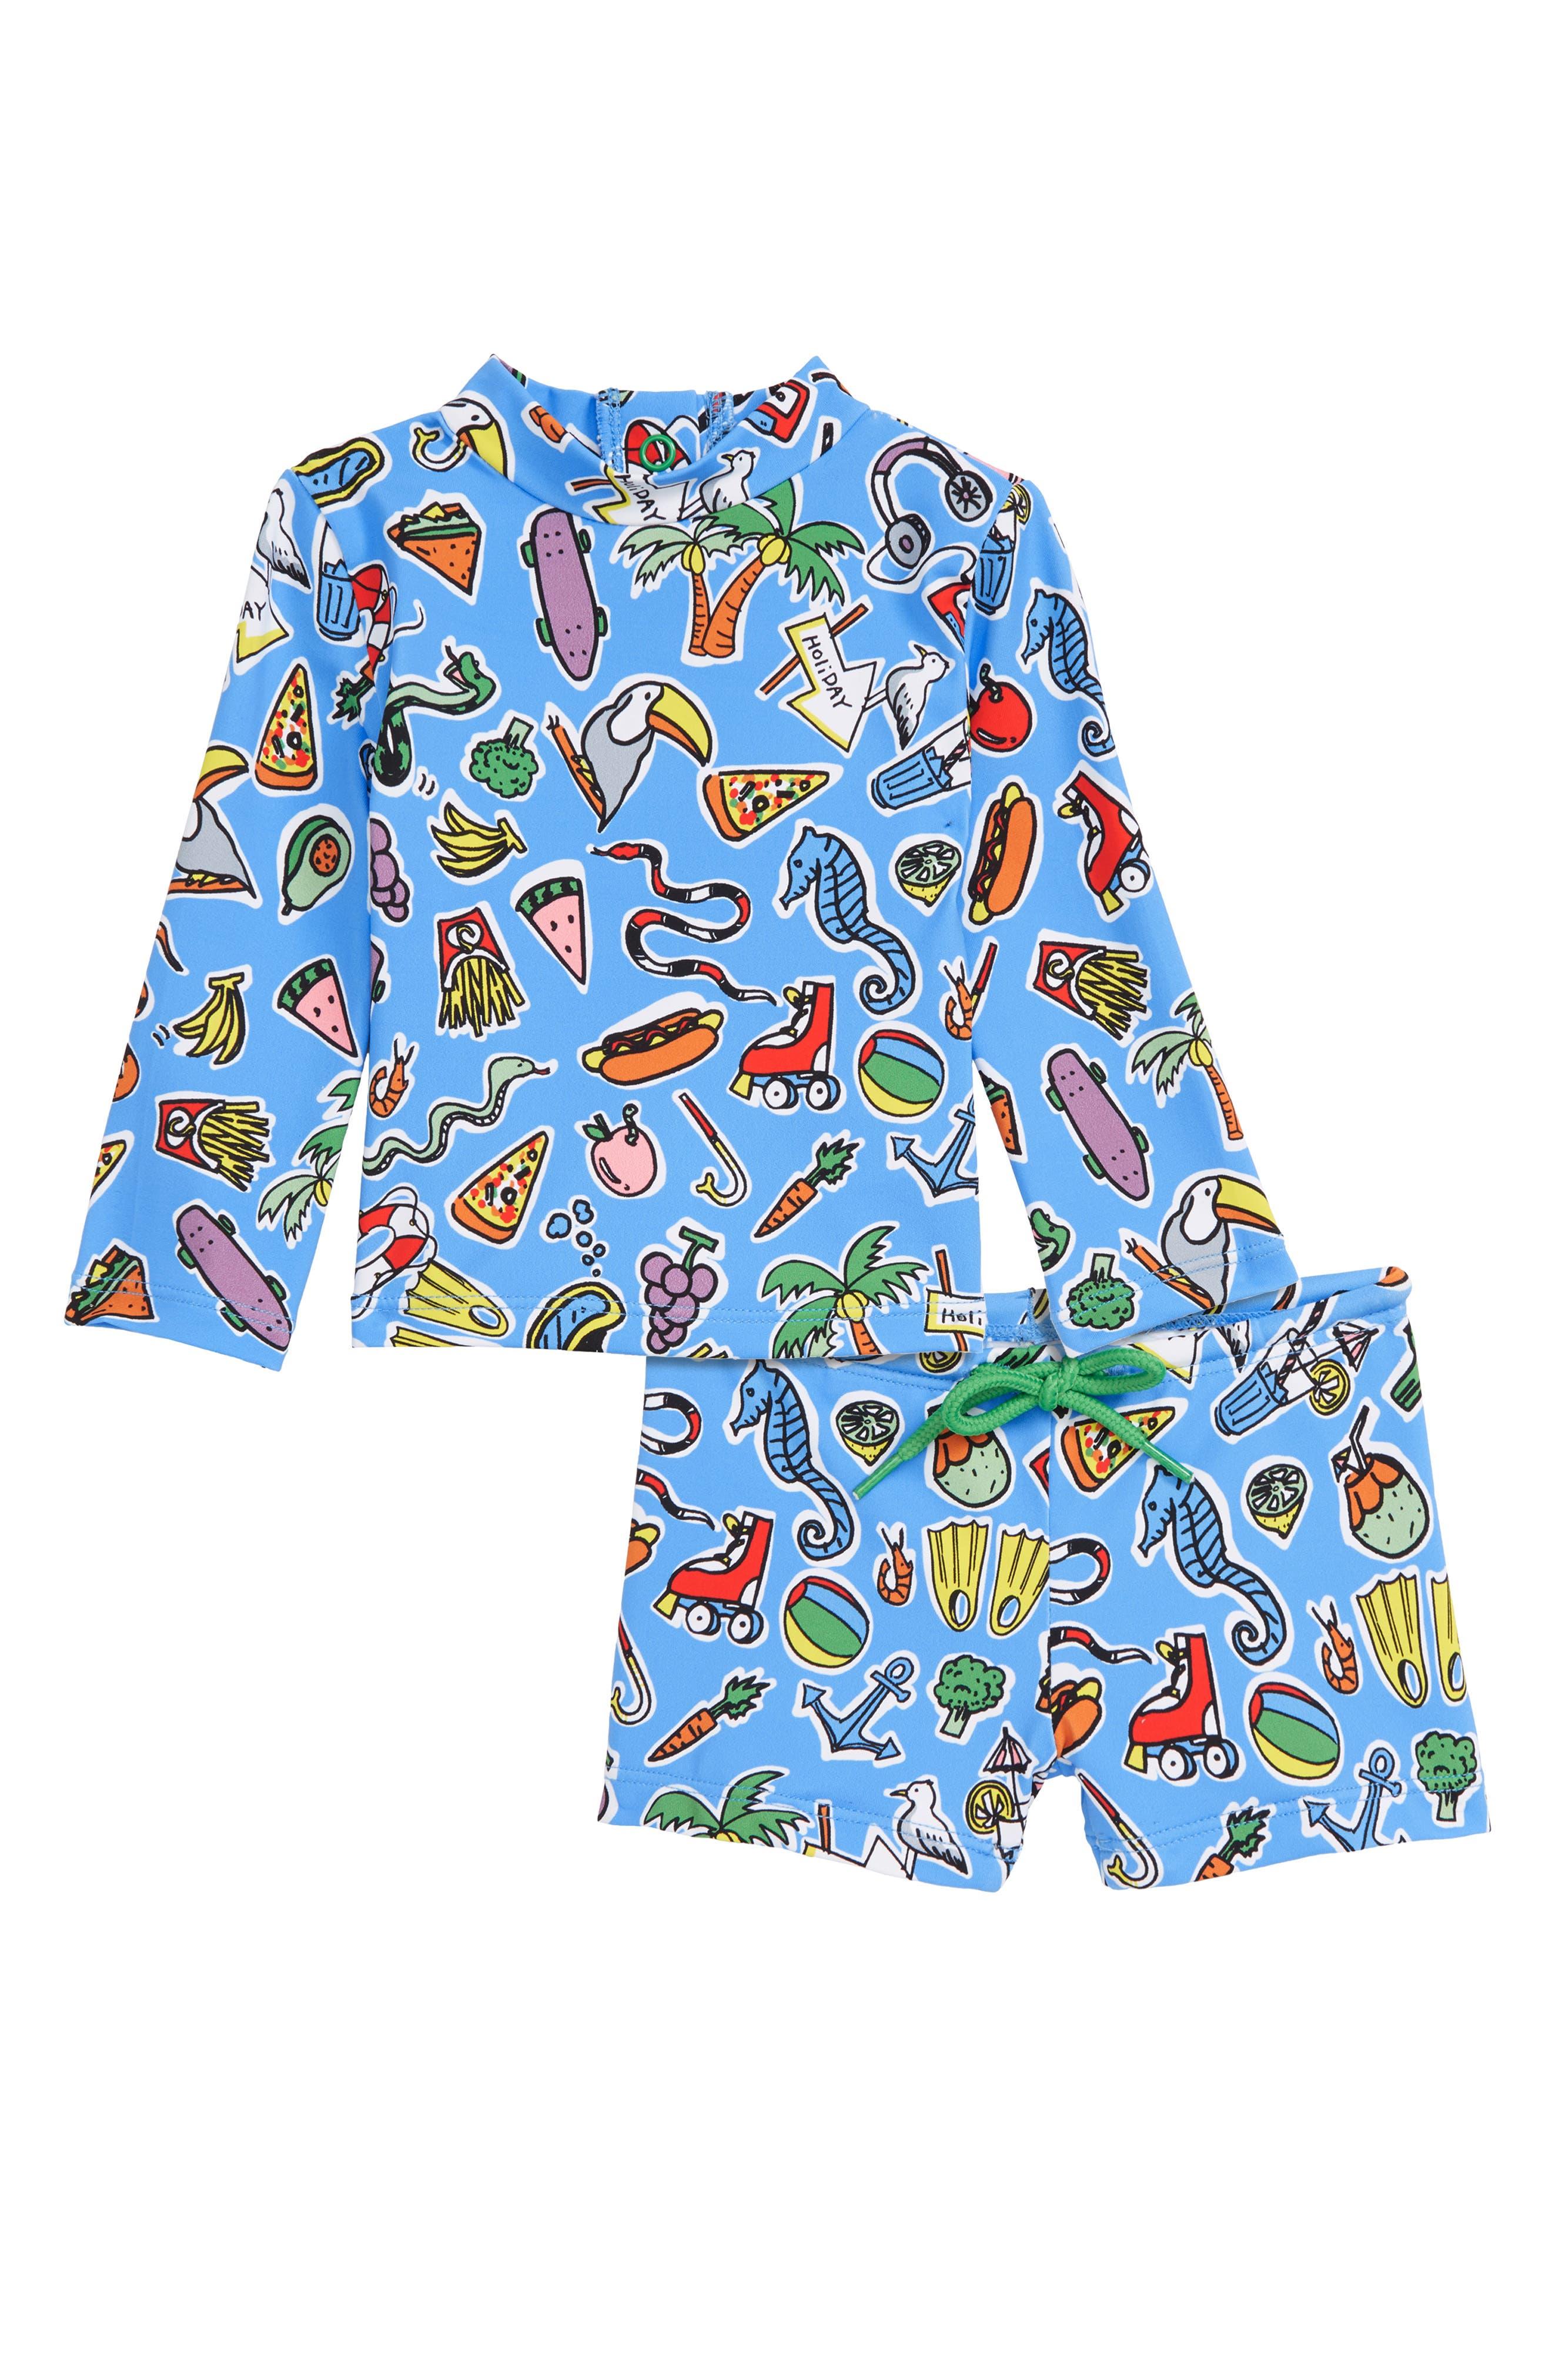 Stella McCartney Print Two-Piece Rashguard Swimsuit, Main, color, BLUE